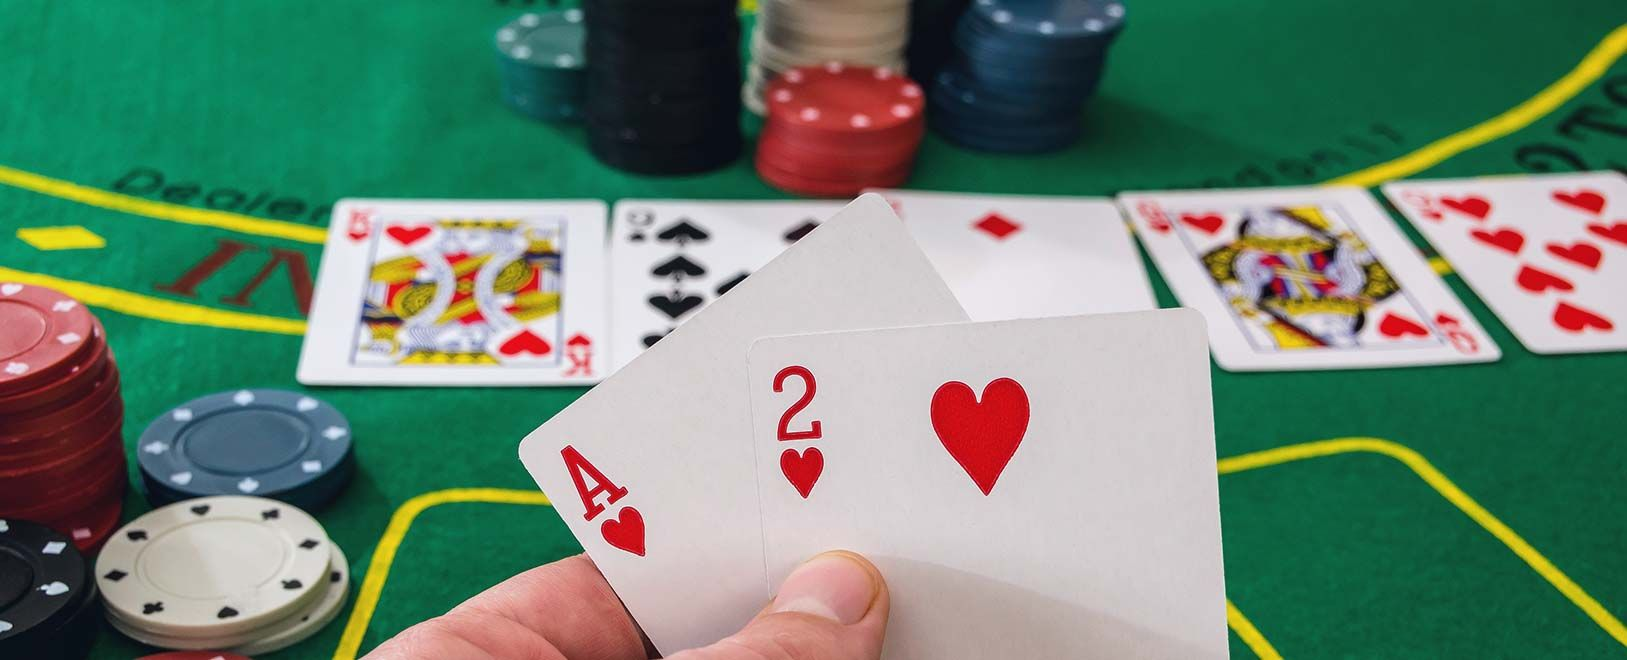 3 Best Online Poker Rooms for USA Poker Players Poker